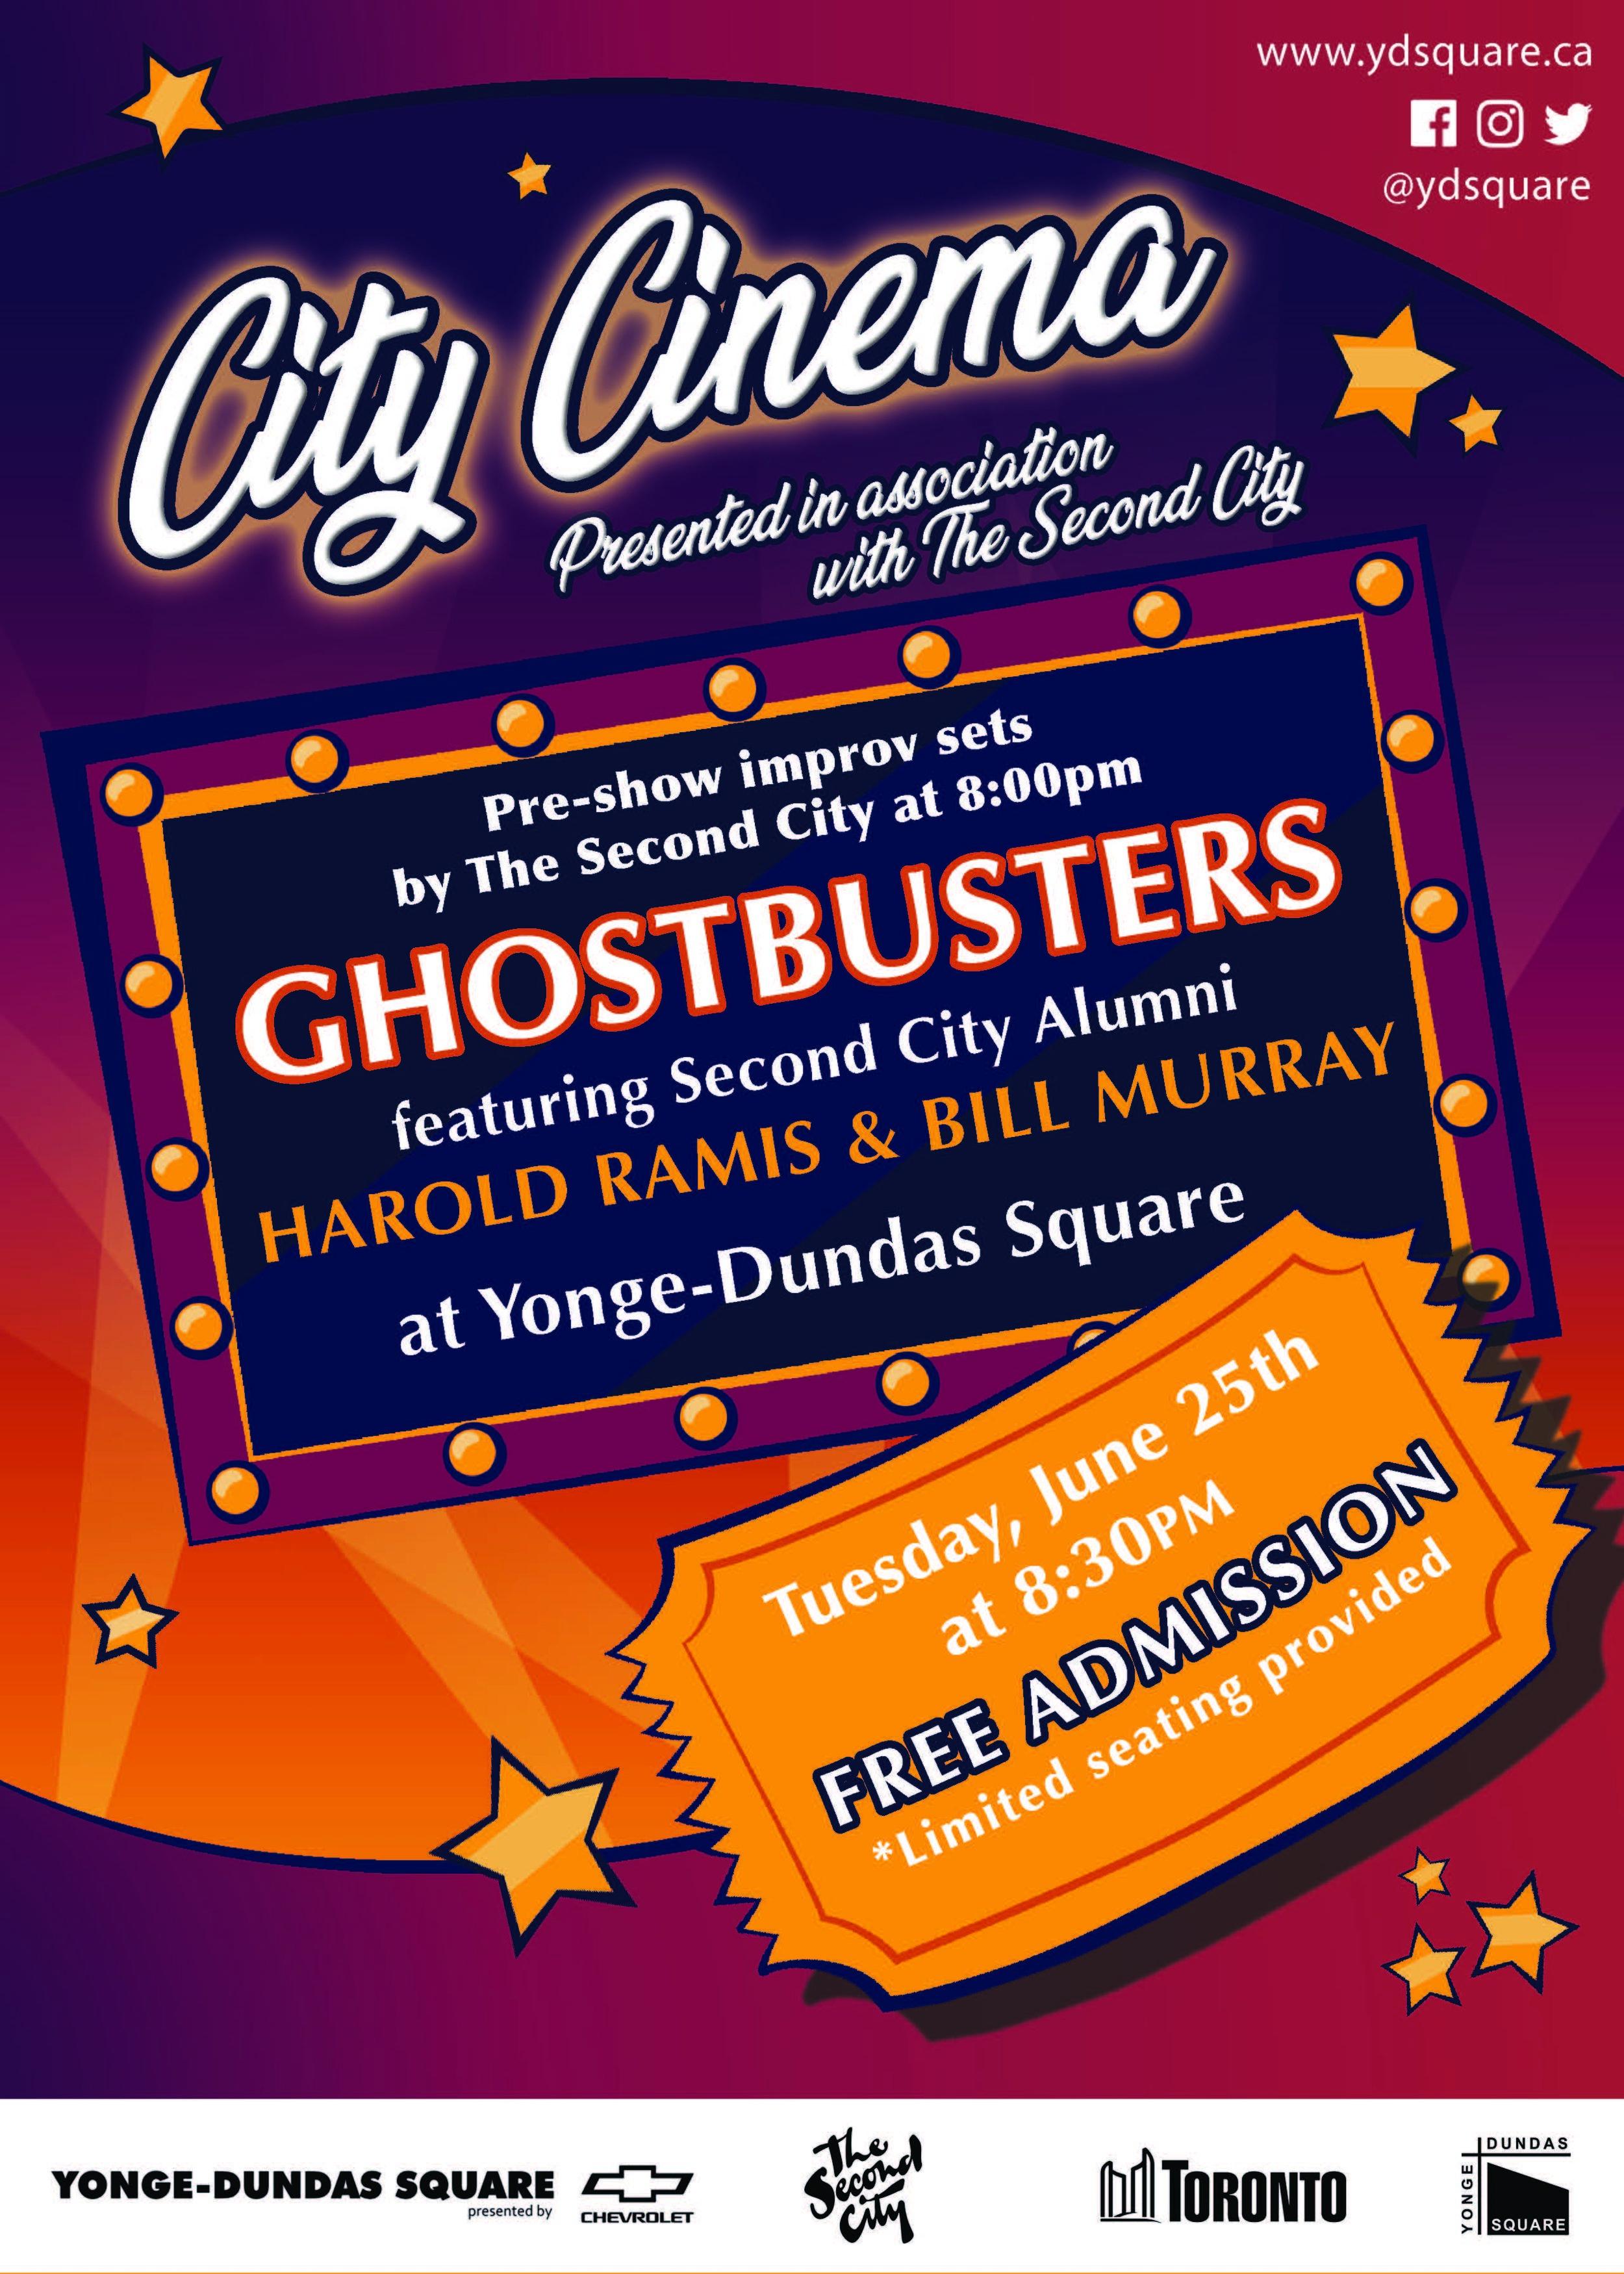 City Cinema Ghostbusters Poster.jpg